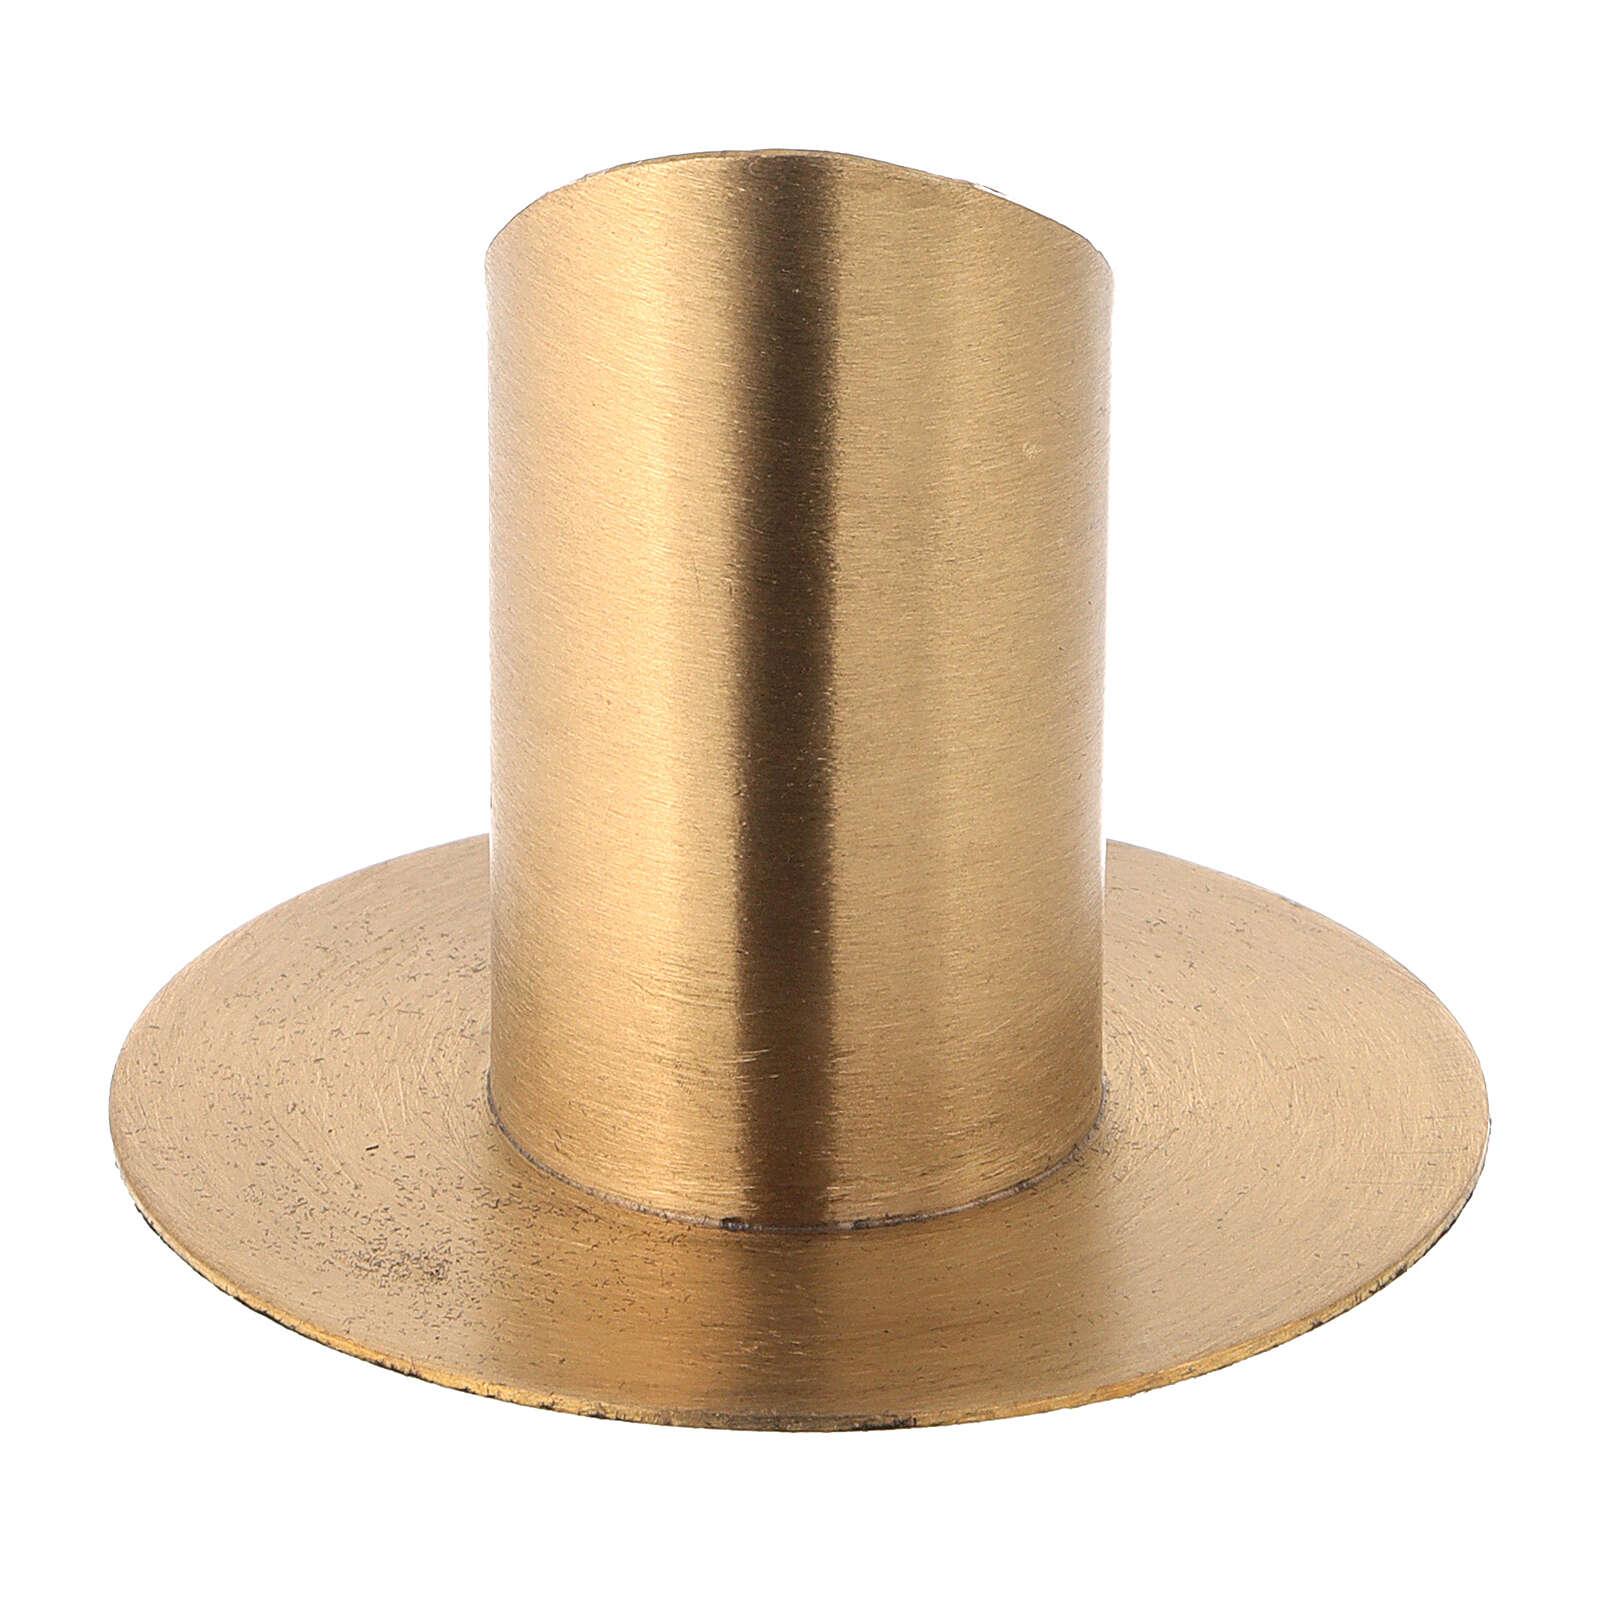 Portacandela ottone nichelato satinato diametro 3,5 cm 4